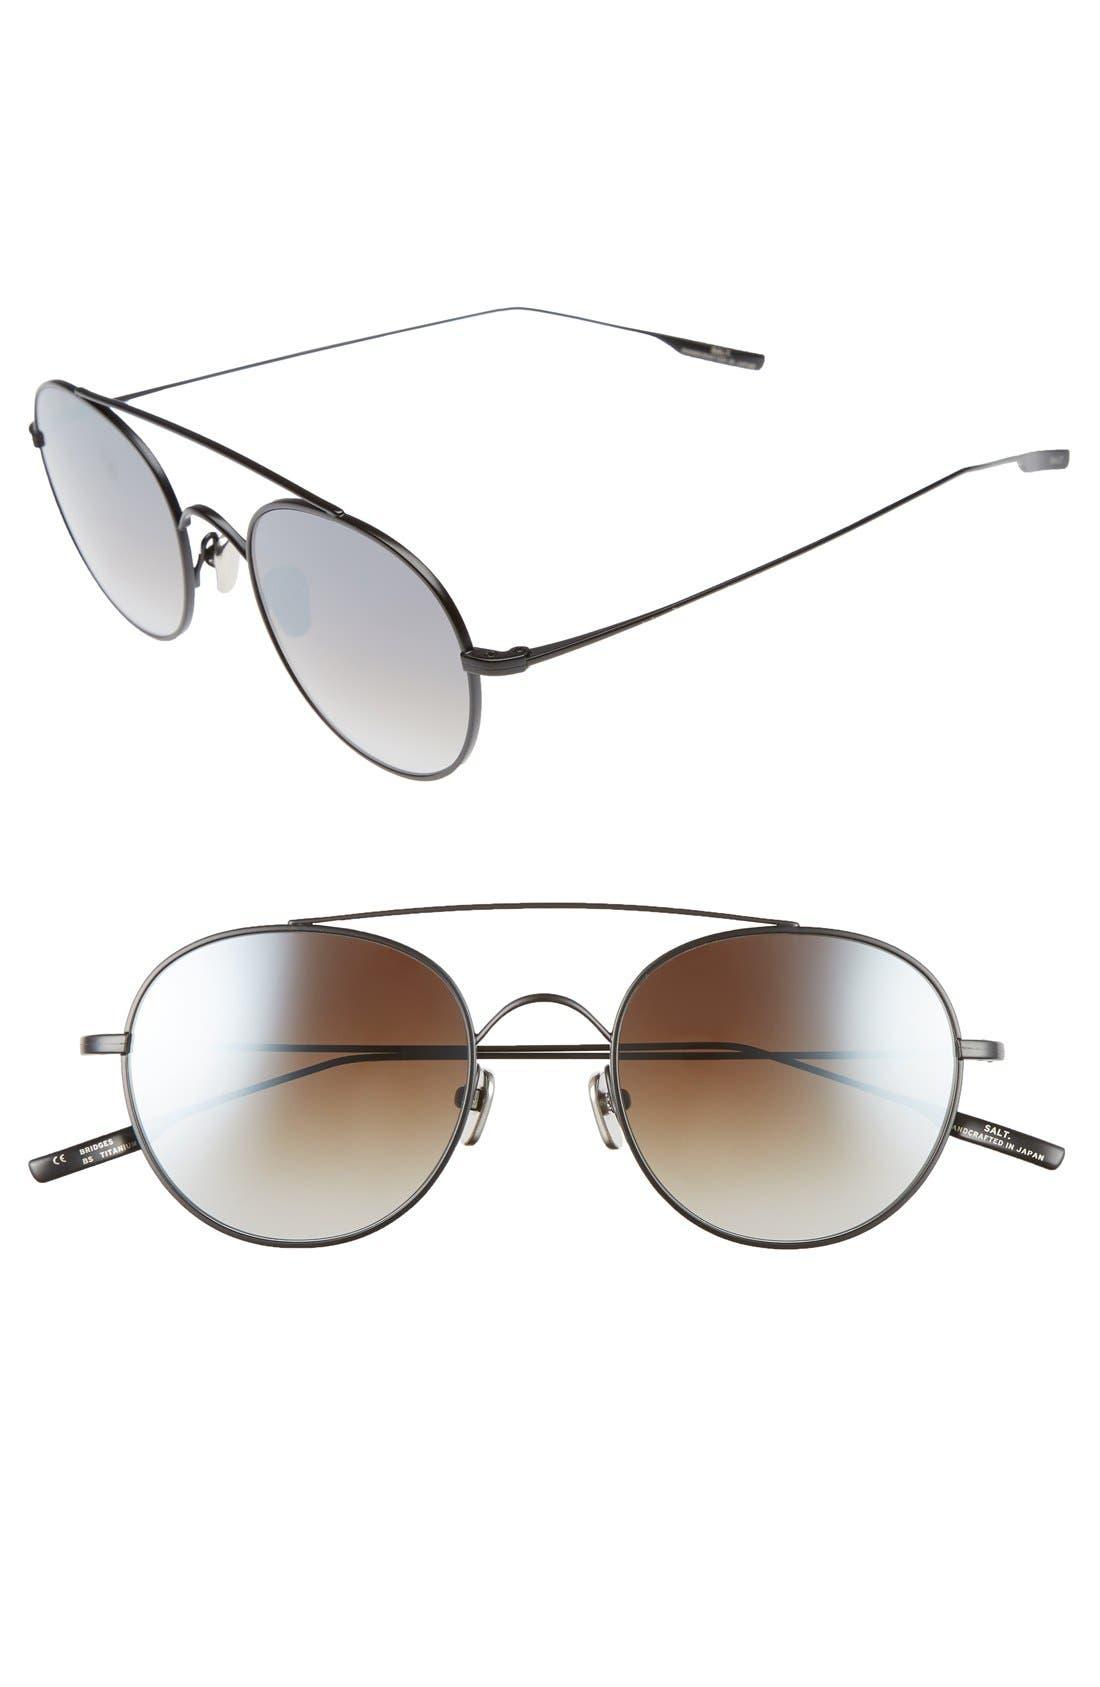 SALT Bridges 51mm Polarized Sunglasses